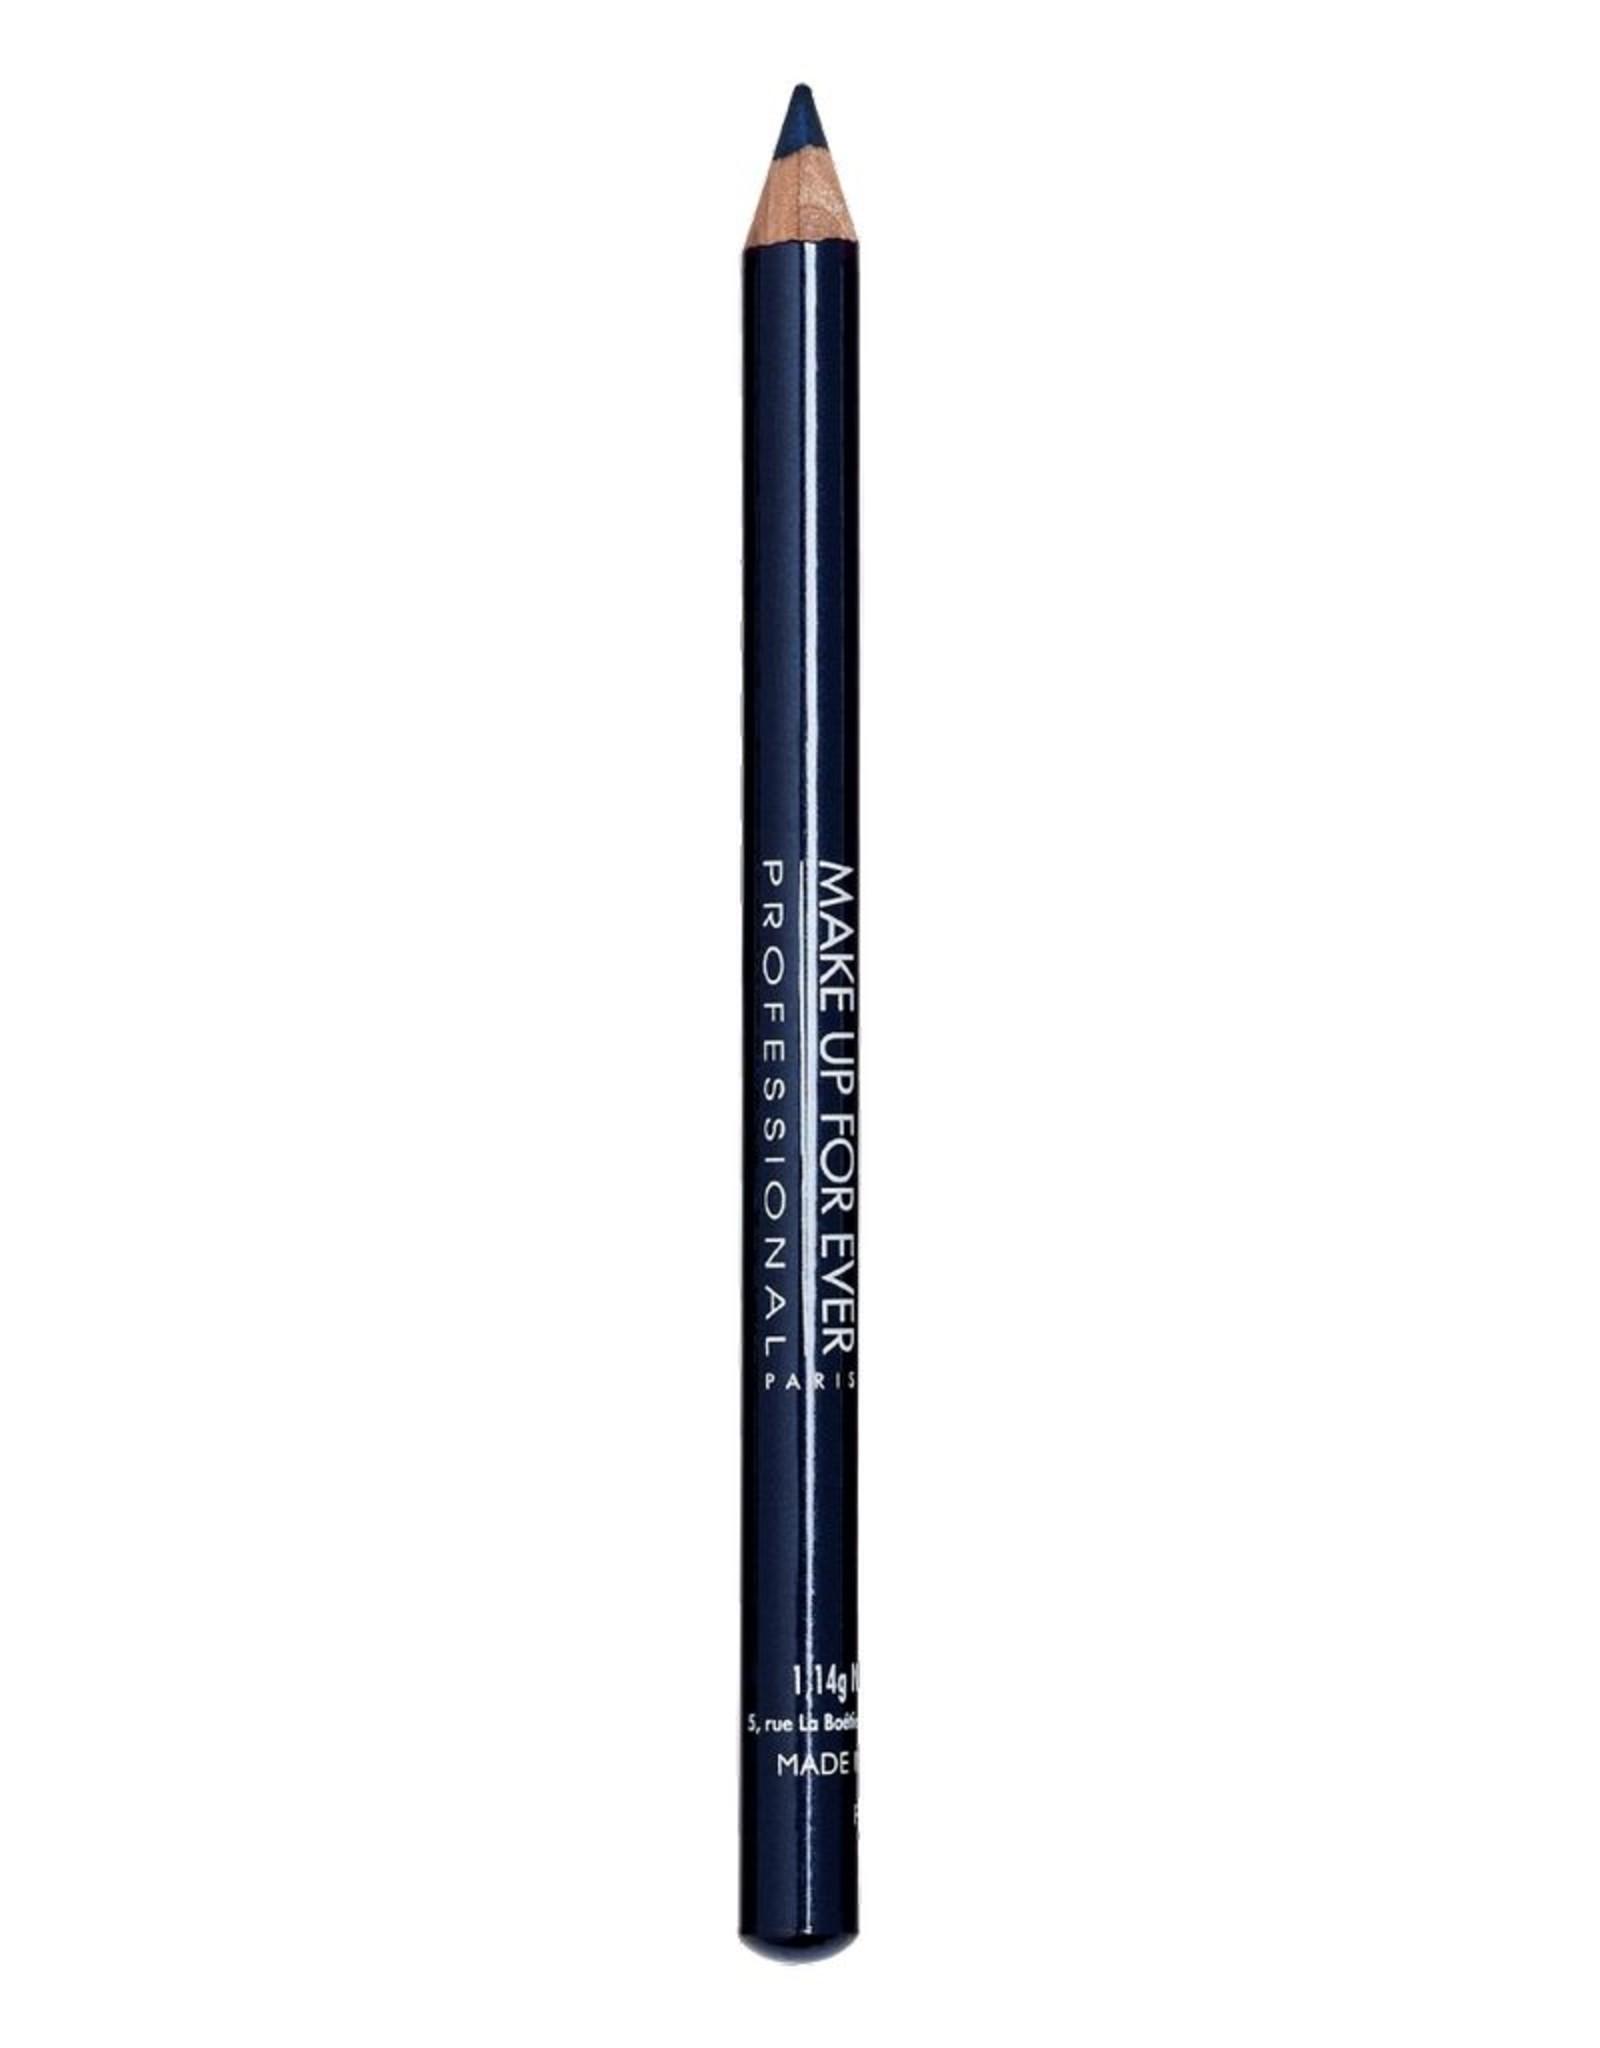 MUFE CRAYON KHOL 1,14g8K - bleu profond nacre / pearly deep blue   (MB391 Smoky Couleur)